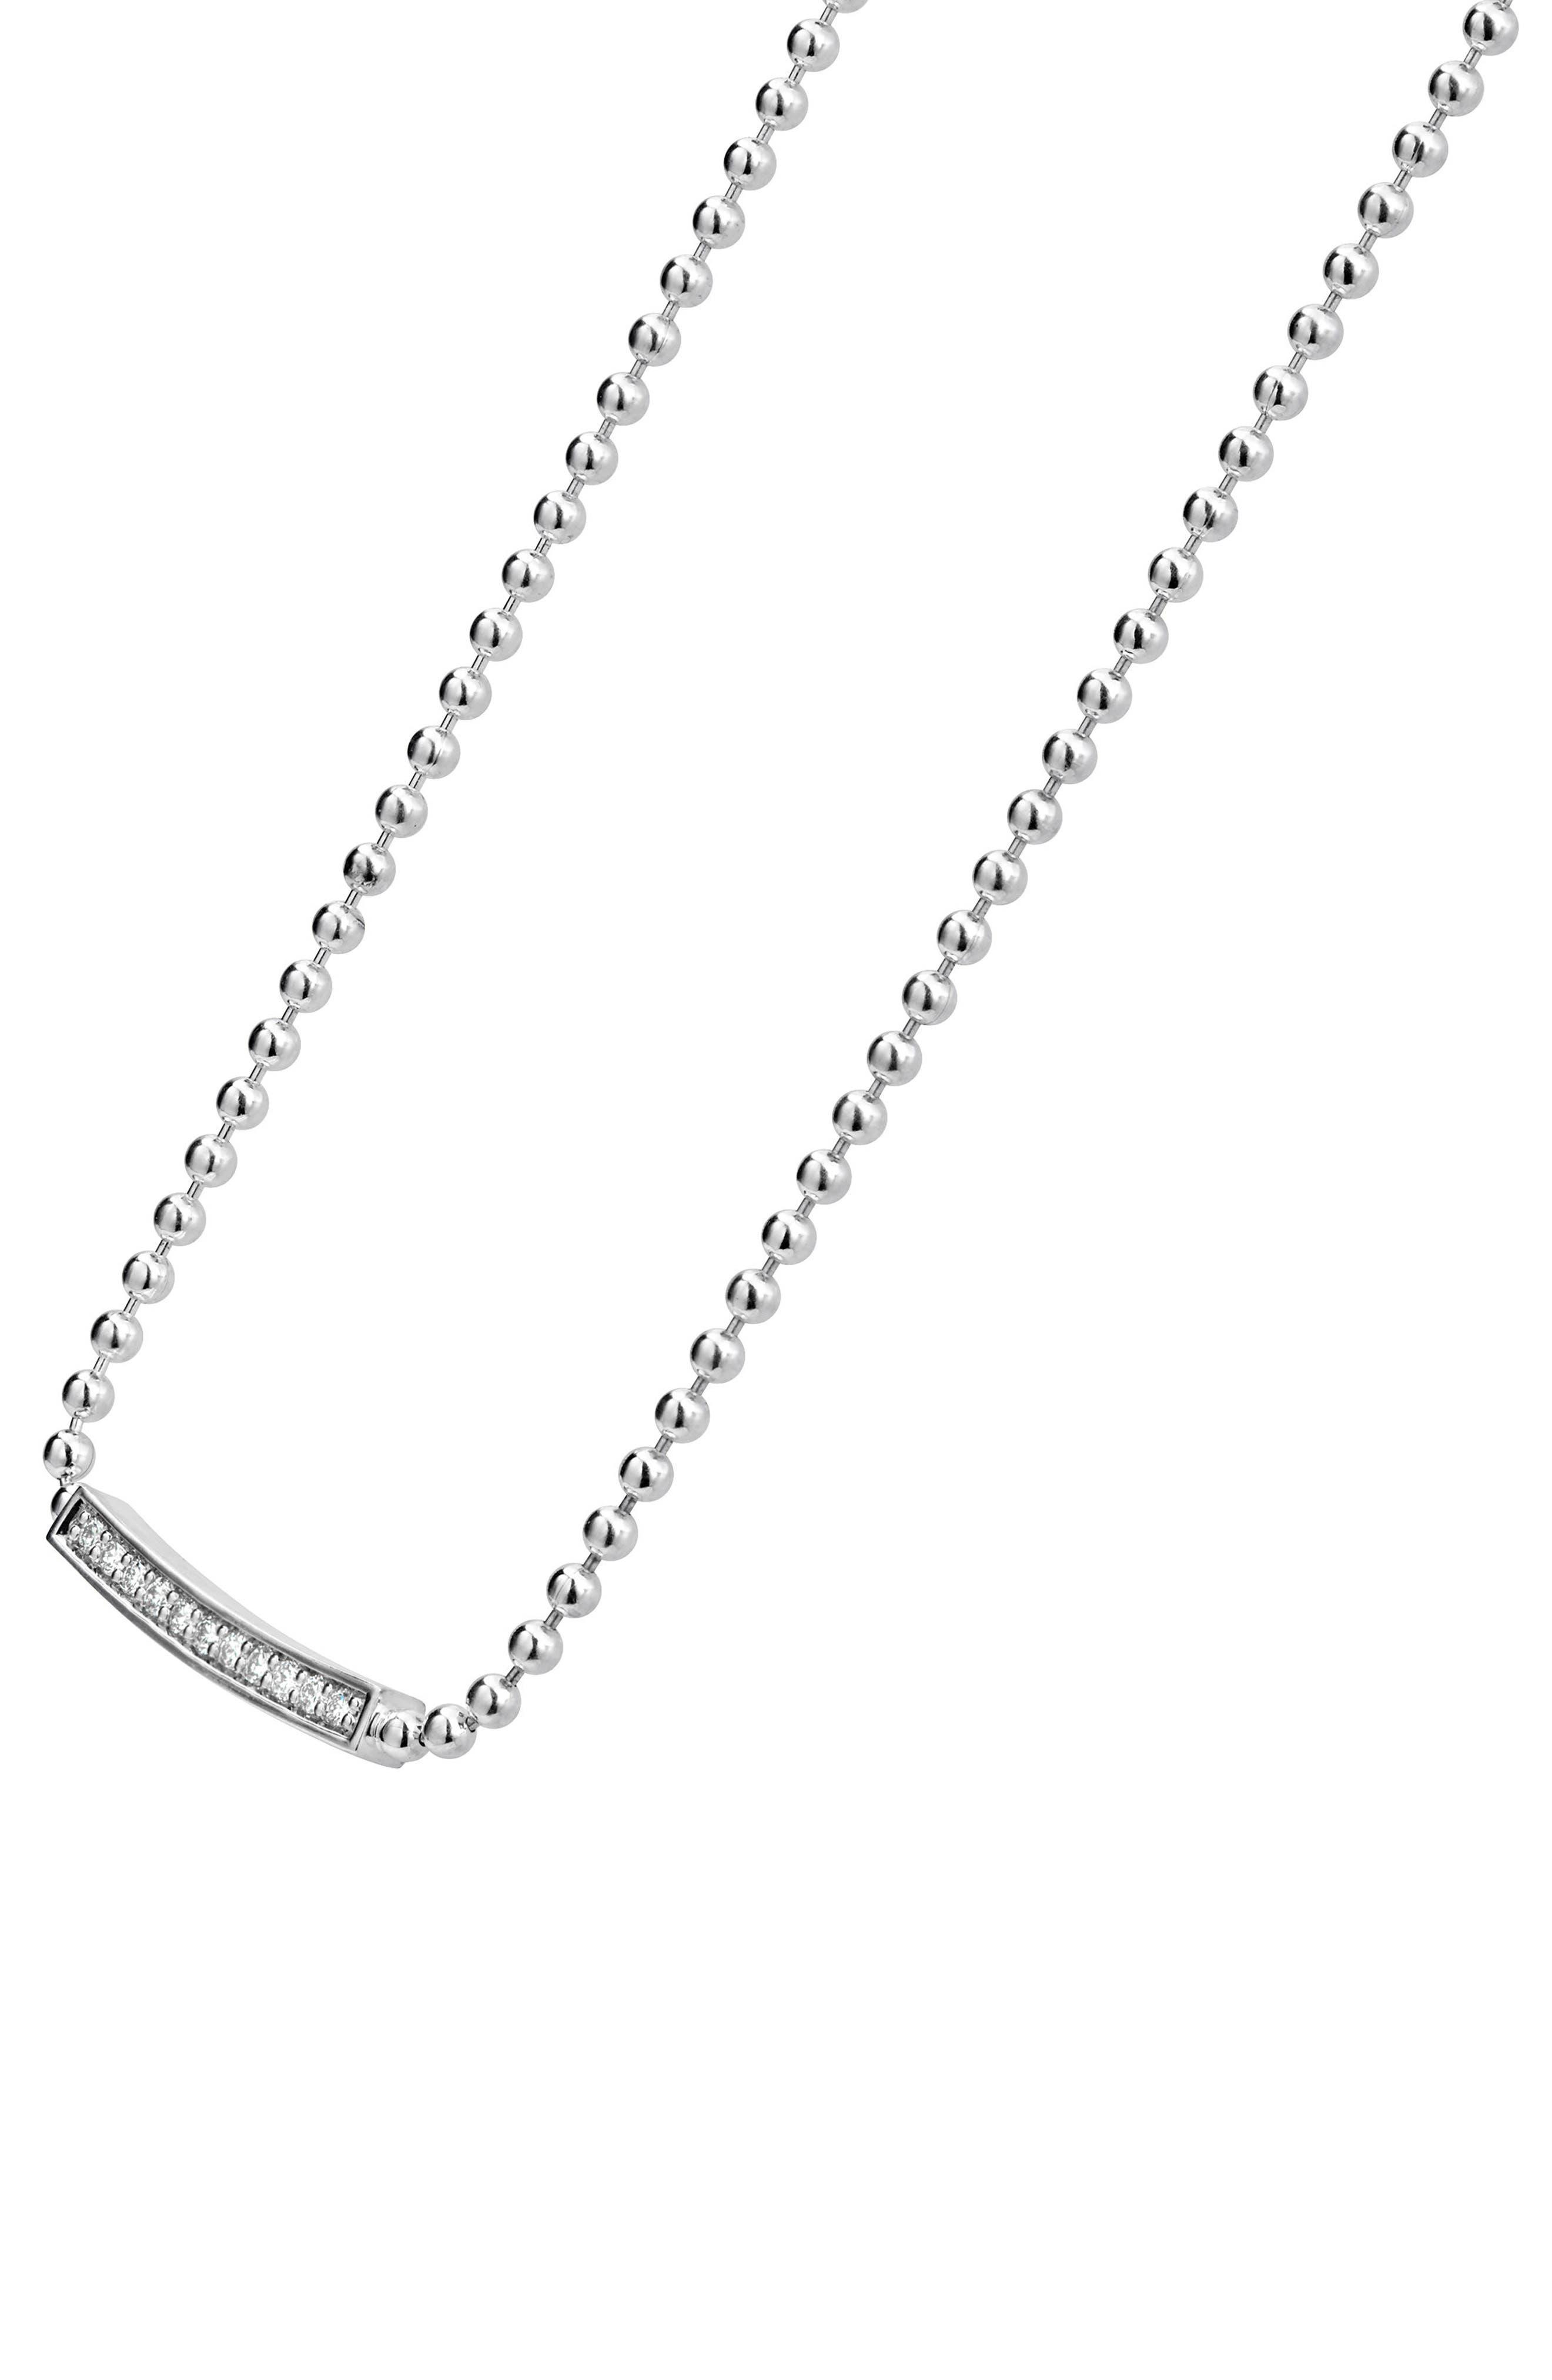 Caviar Spark Diamond Pendant Necklace,                             Alternate thumbnail 5, color,                             SILVER/ DIAMOND